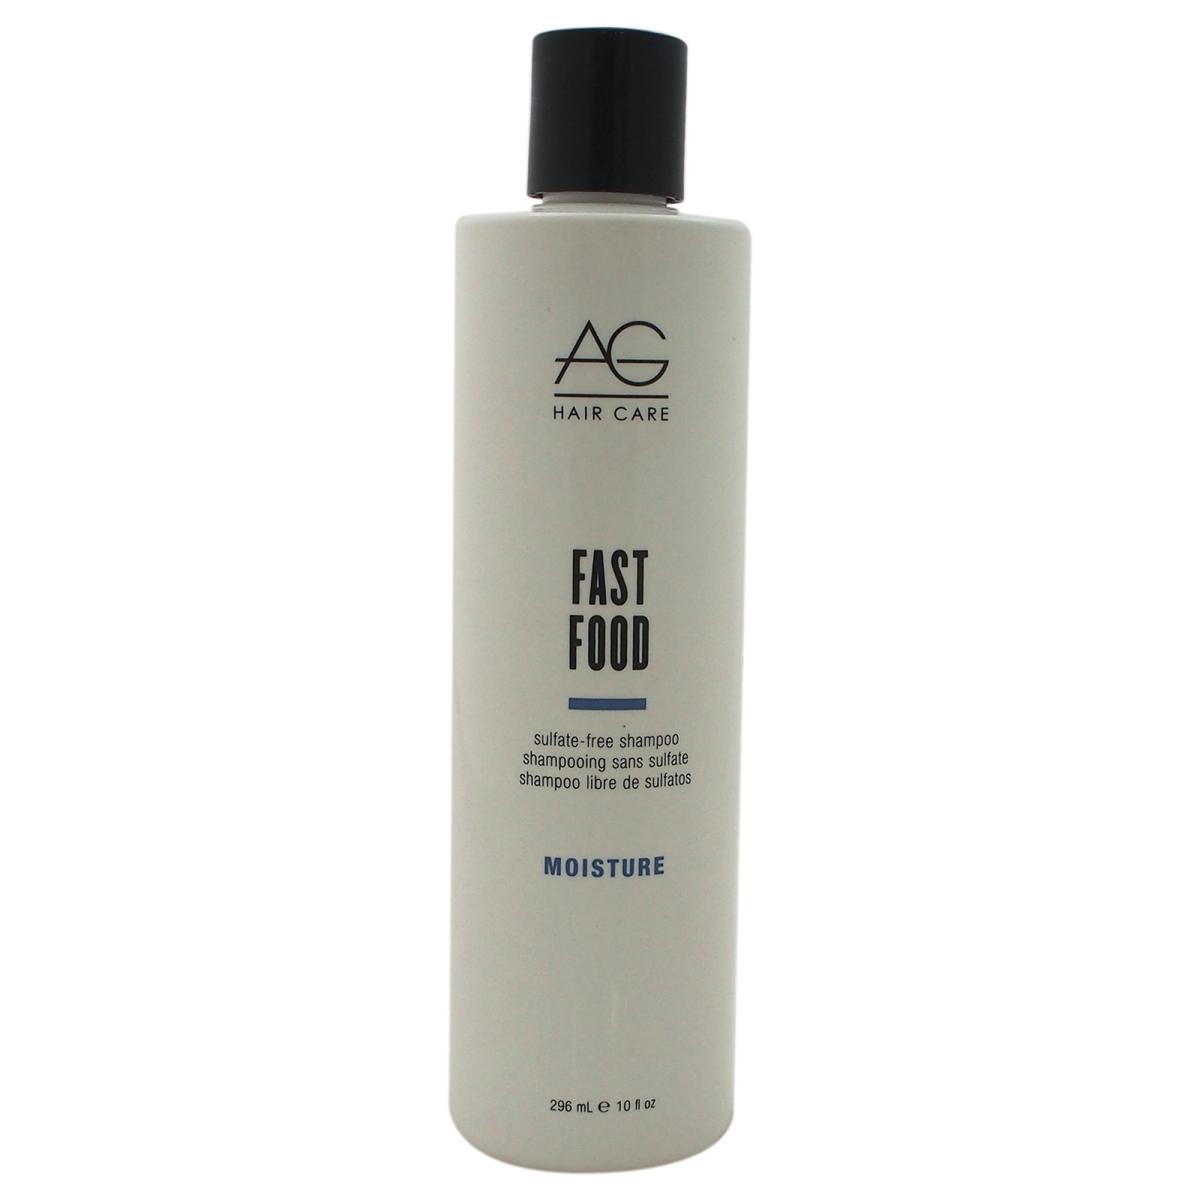 AG Hair Cosmetics U-HC-10819 Moisture Fast Food Sulfate-Free Shampoo for Unisex - 10 oz